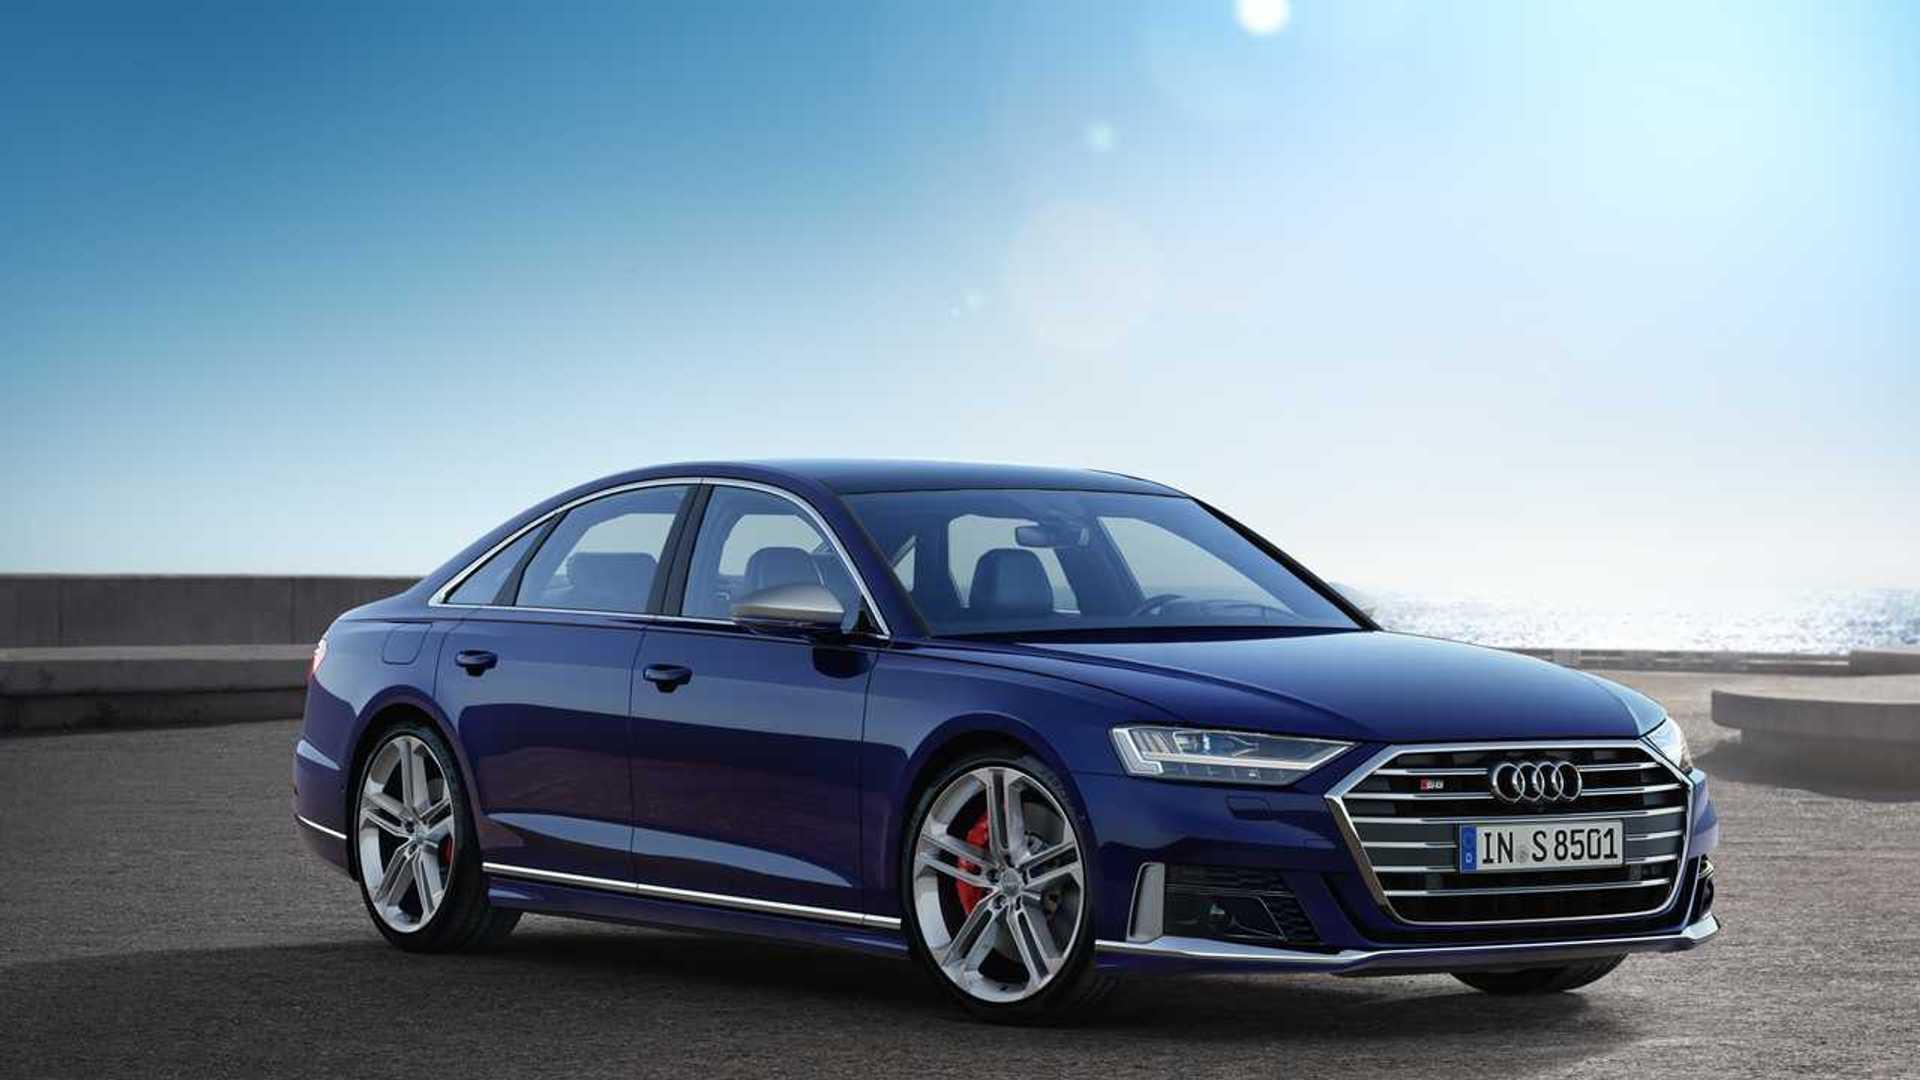 2020 Audi A8 Speed Test